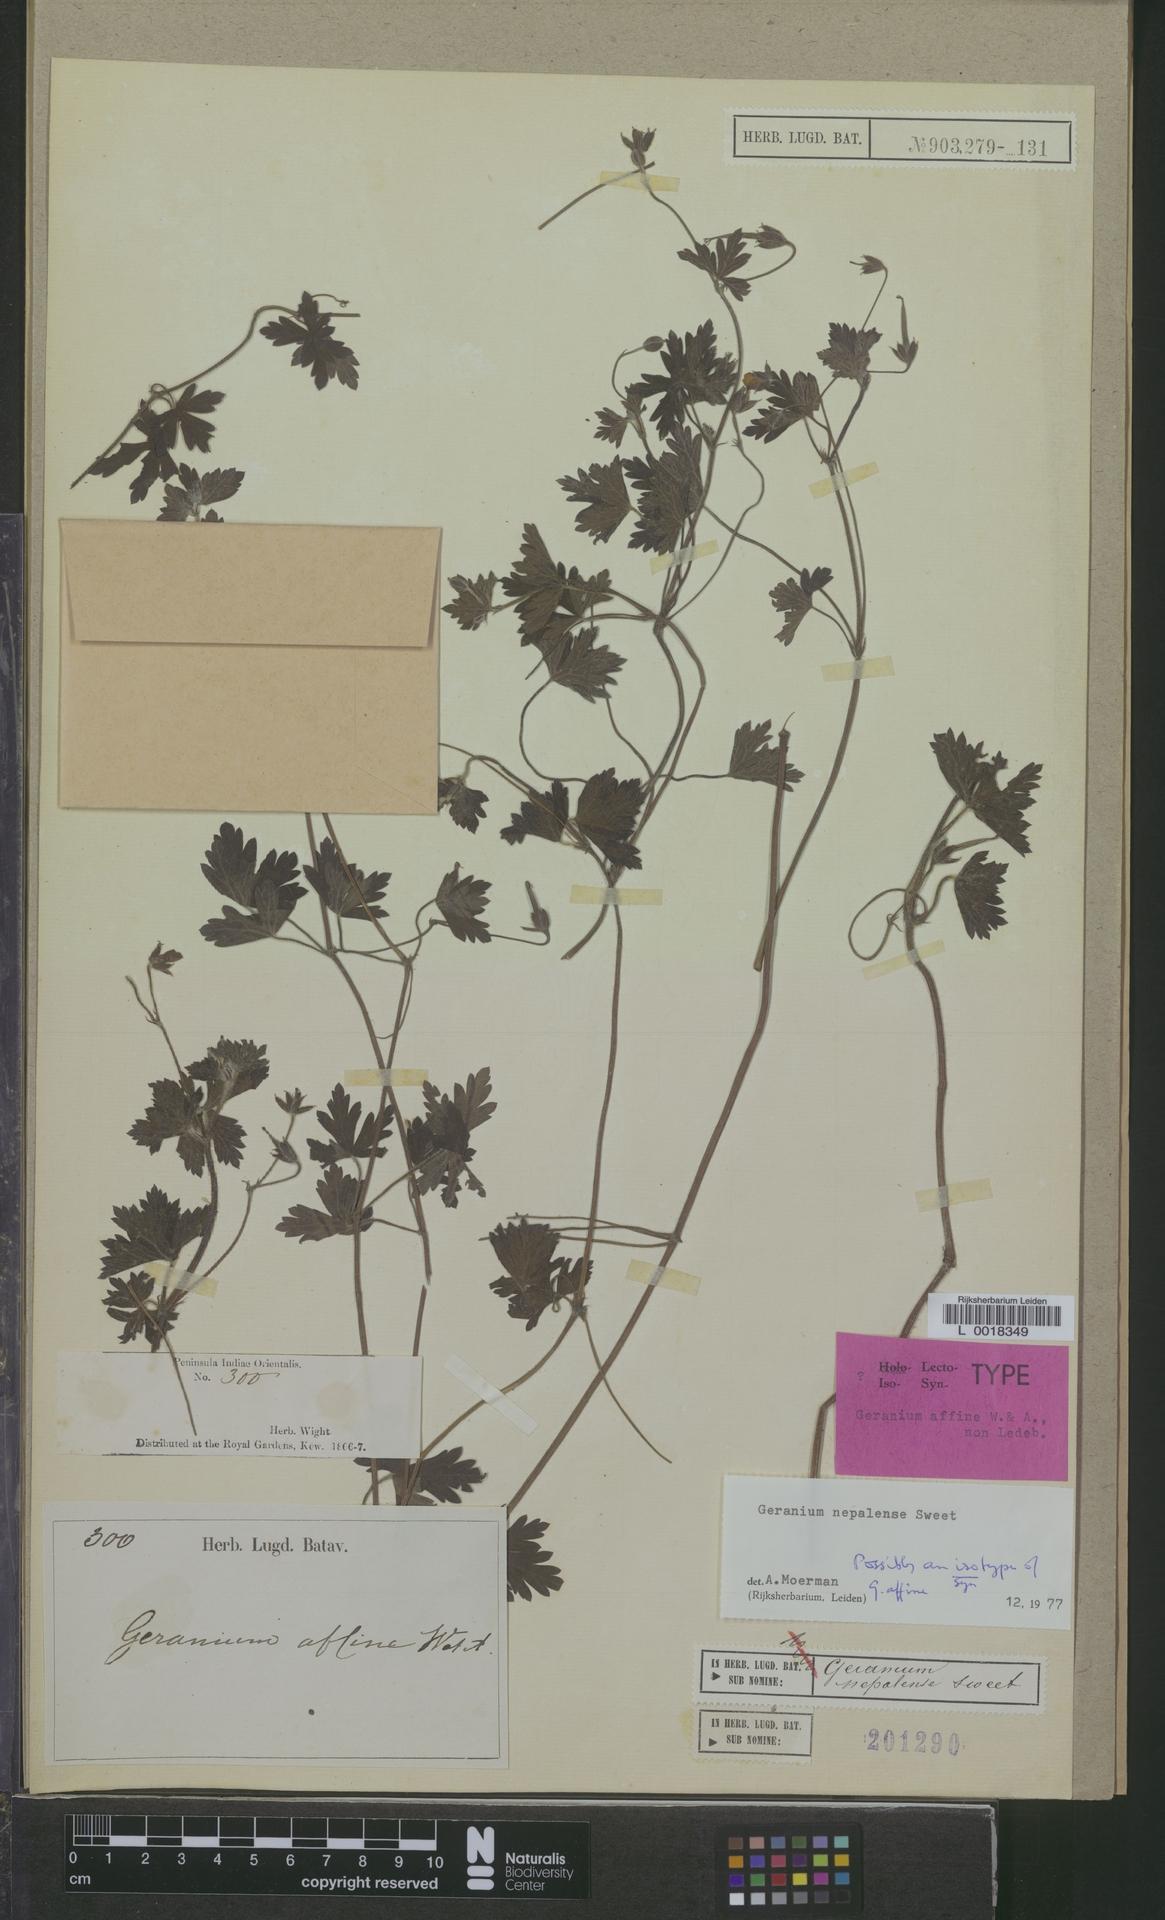 L  0018349 | Geranium nepalense Sweet